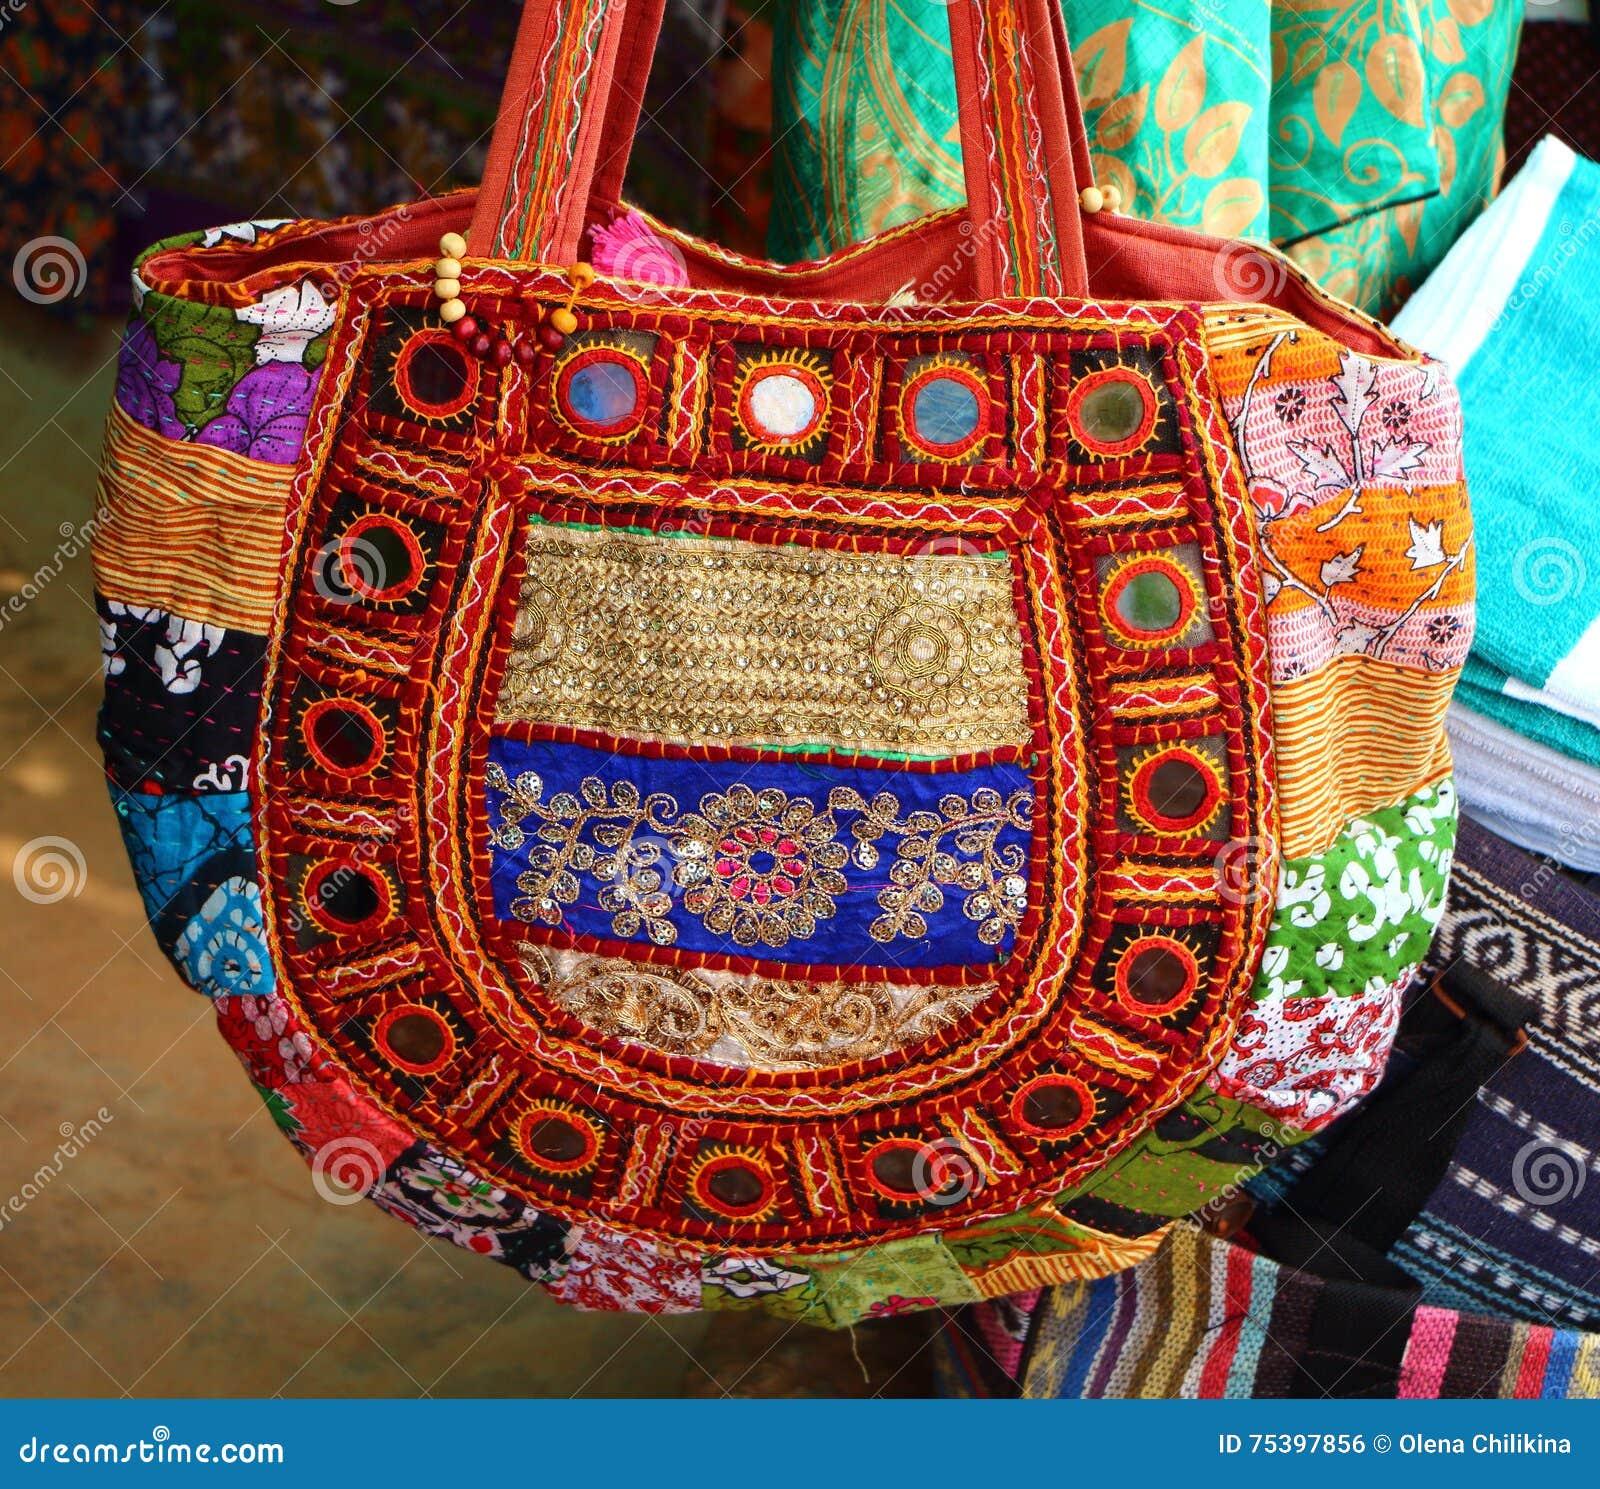 Souvenir Bag At The Gift Shop. India Stock Photo - Image of souvenir ... 5514728b2219d